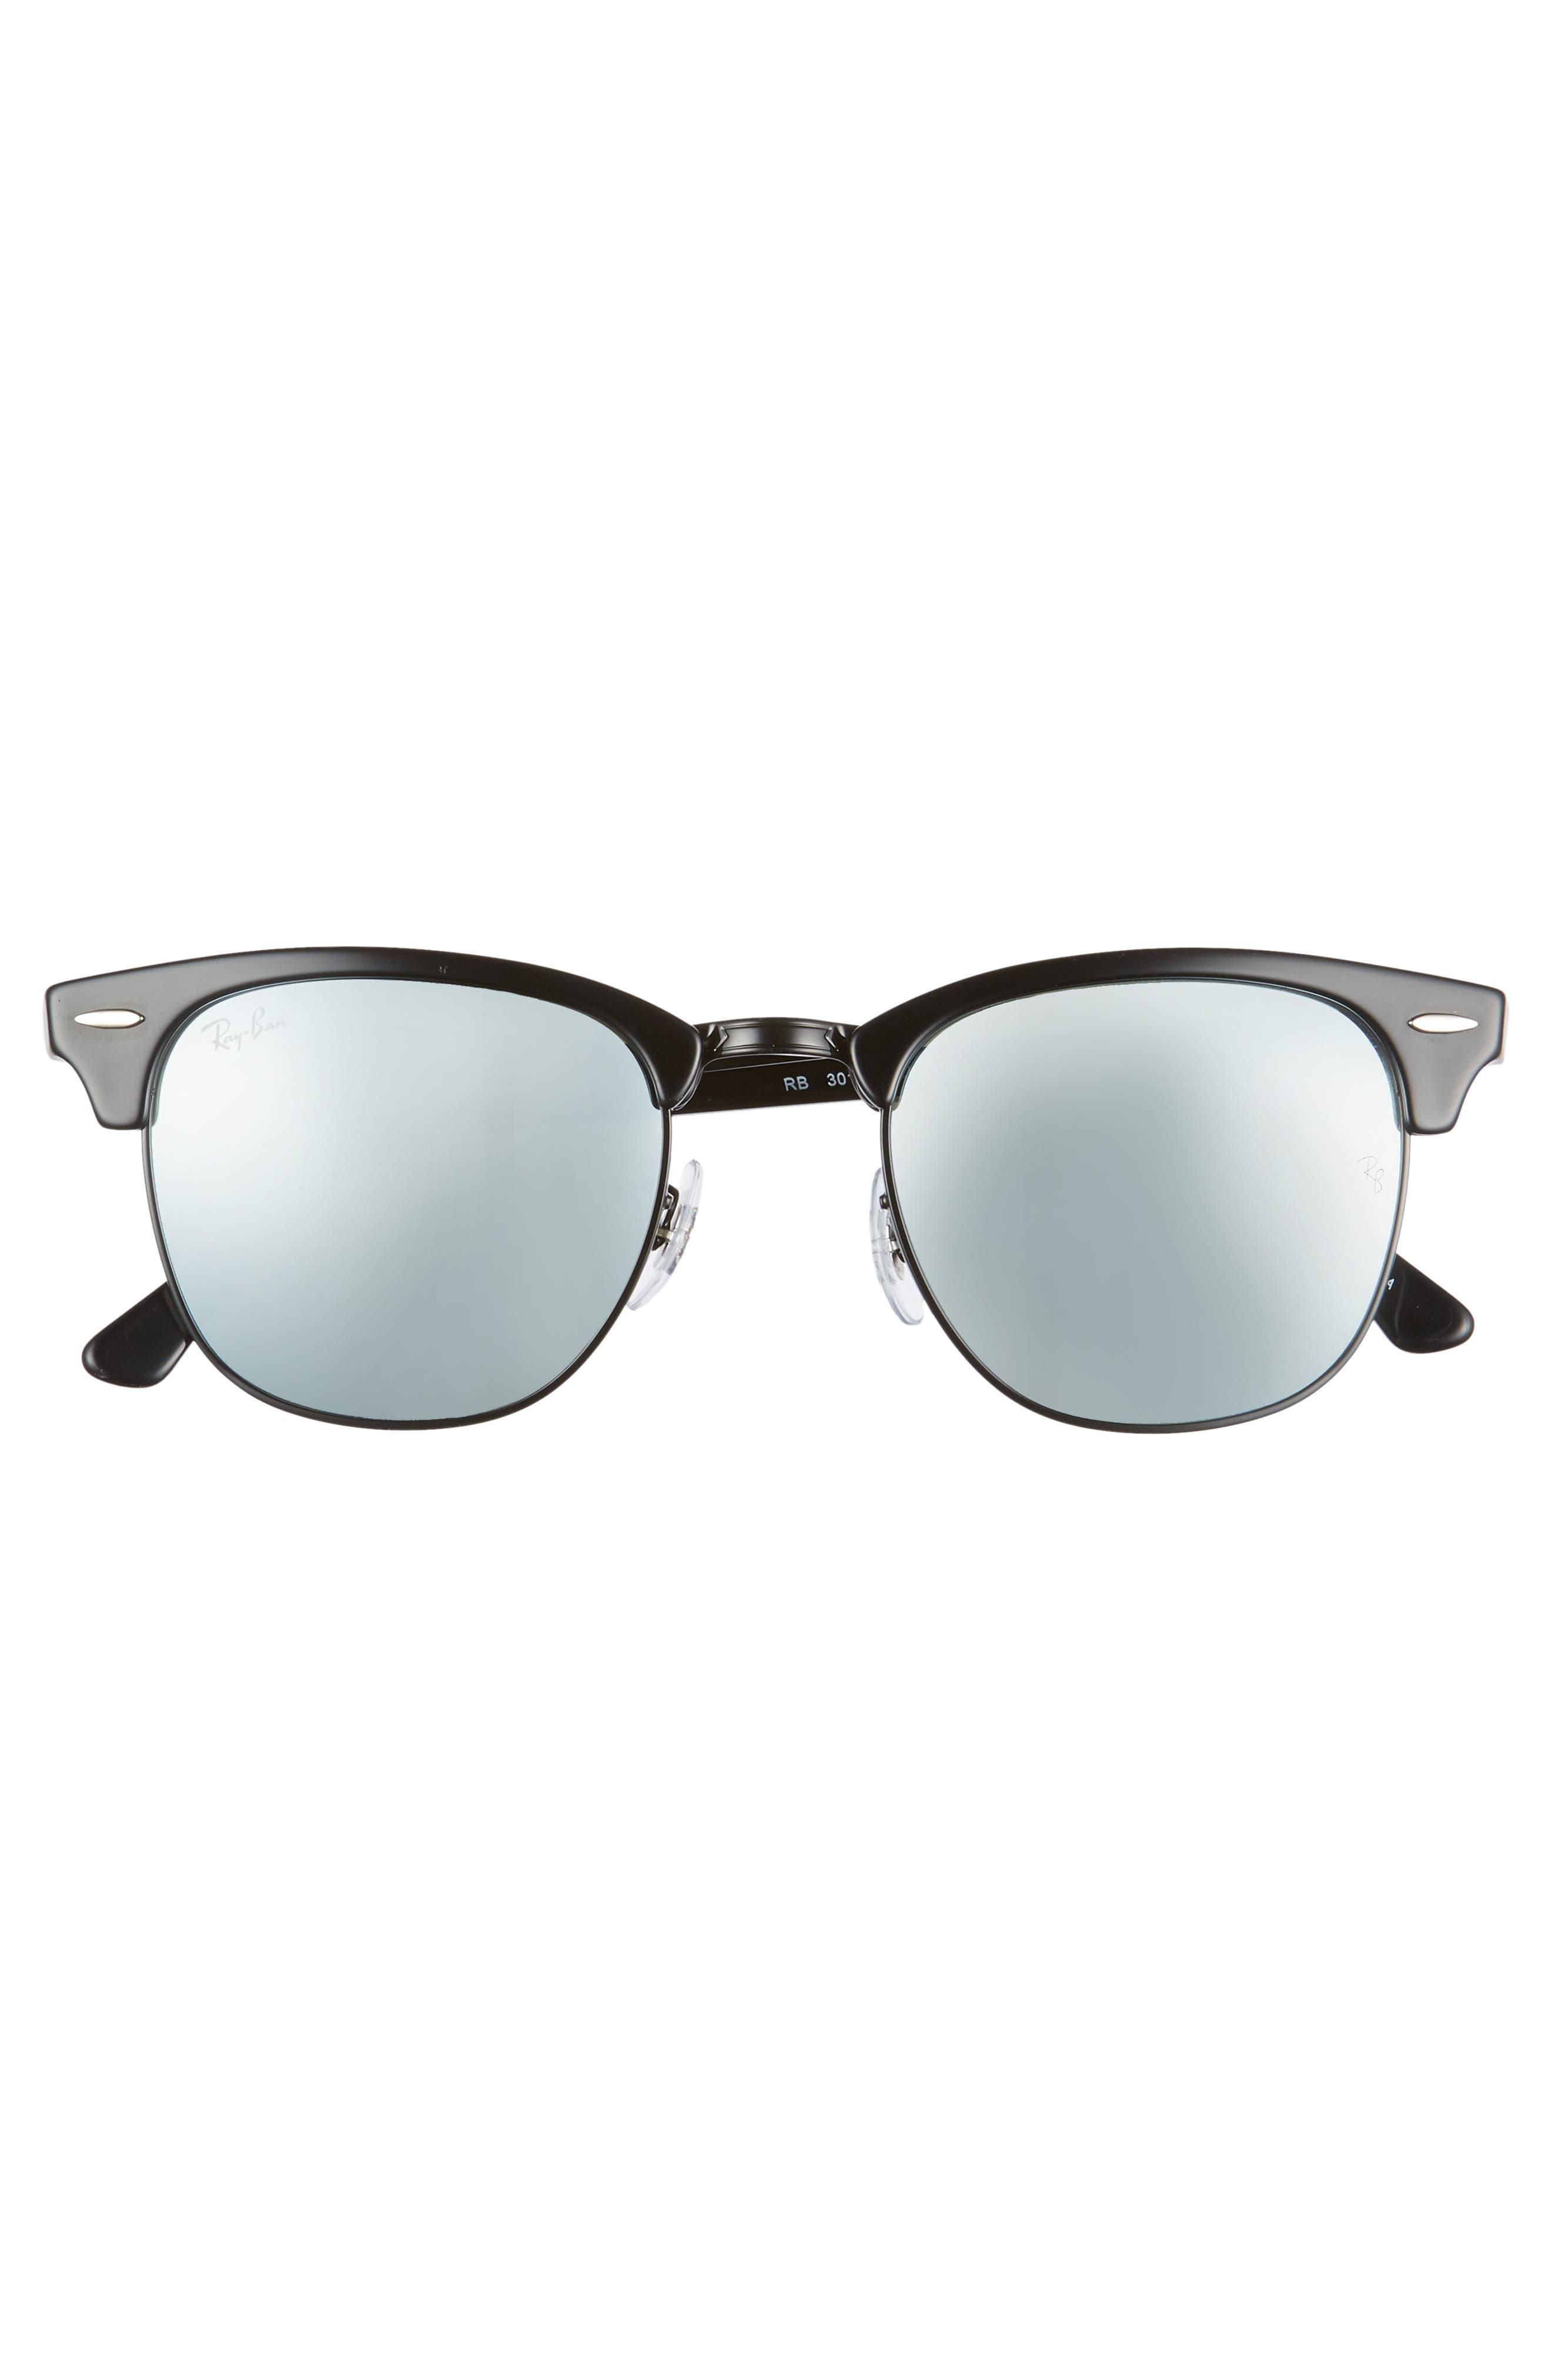 RAY-BAN,                             Standard Clubmaster 51mm Sunglasses,                             Alternate thumbnail 3, color,                             BLACK/ BLUE MIRROR